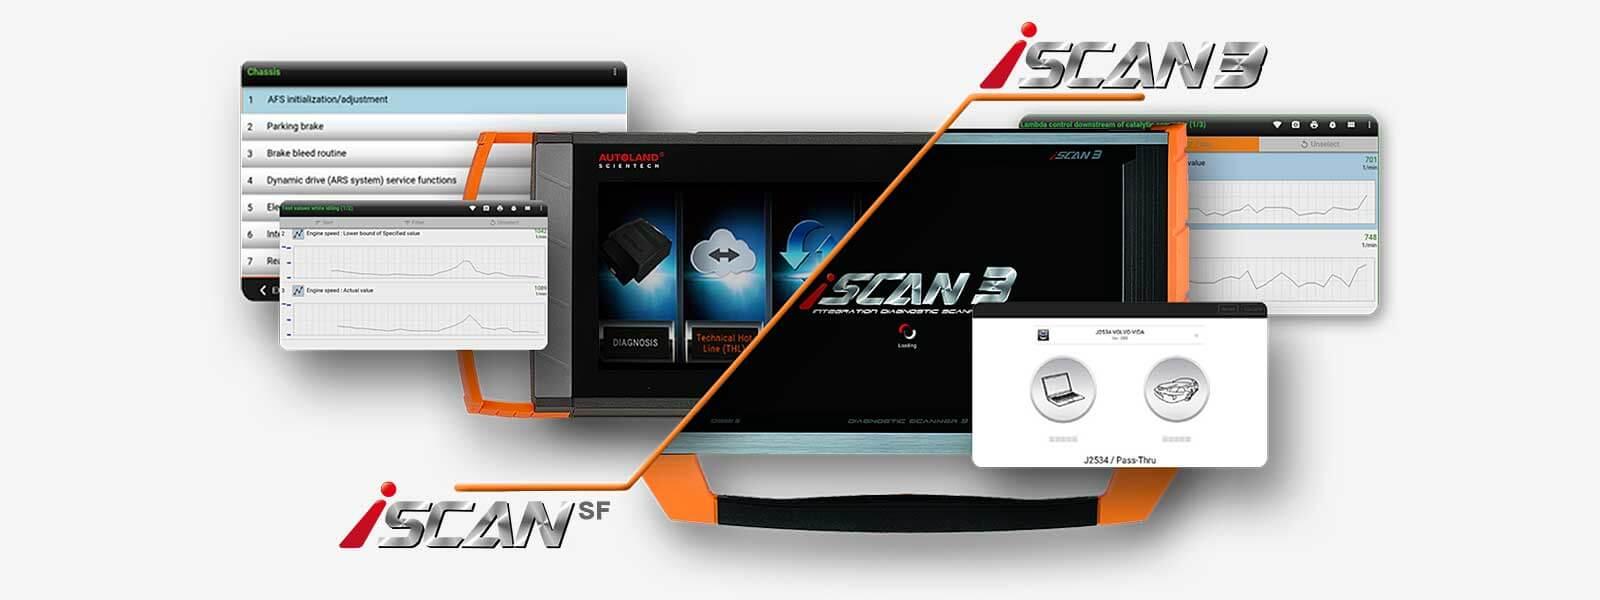 iScan Splitscreen